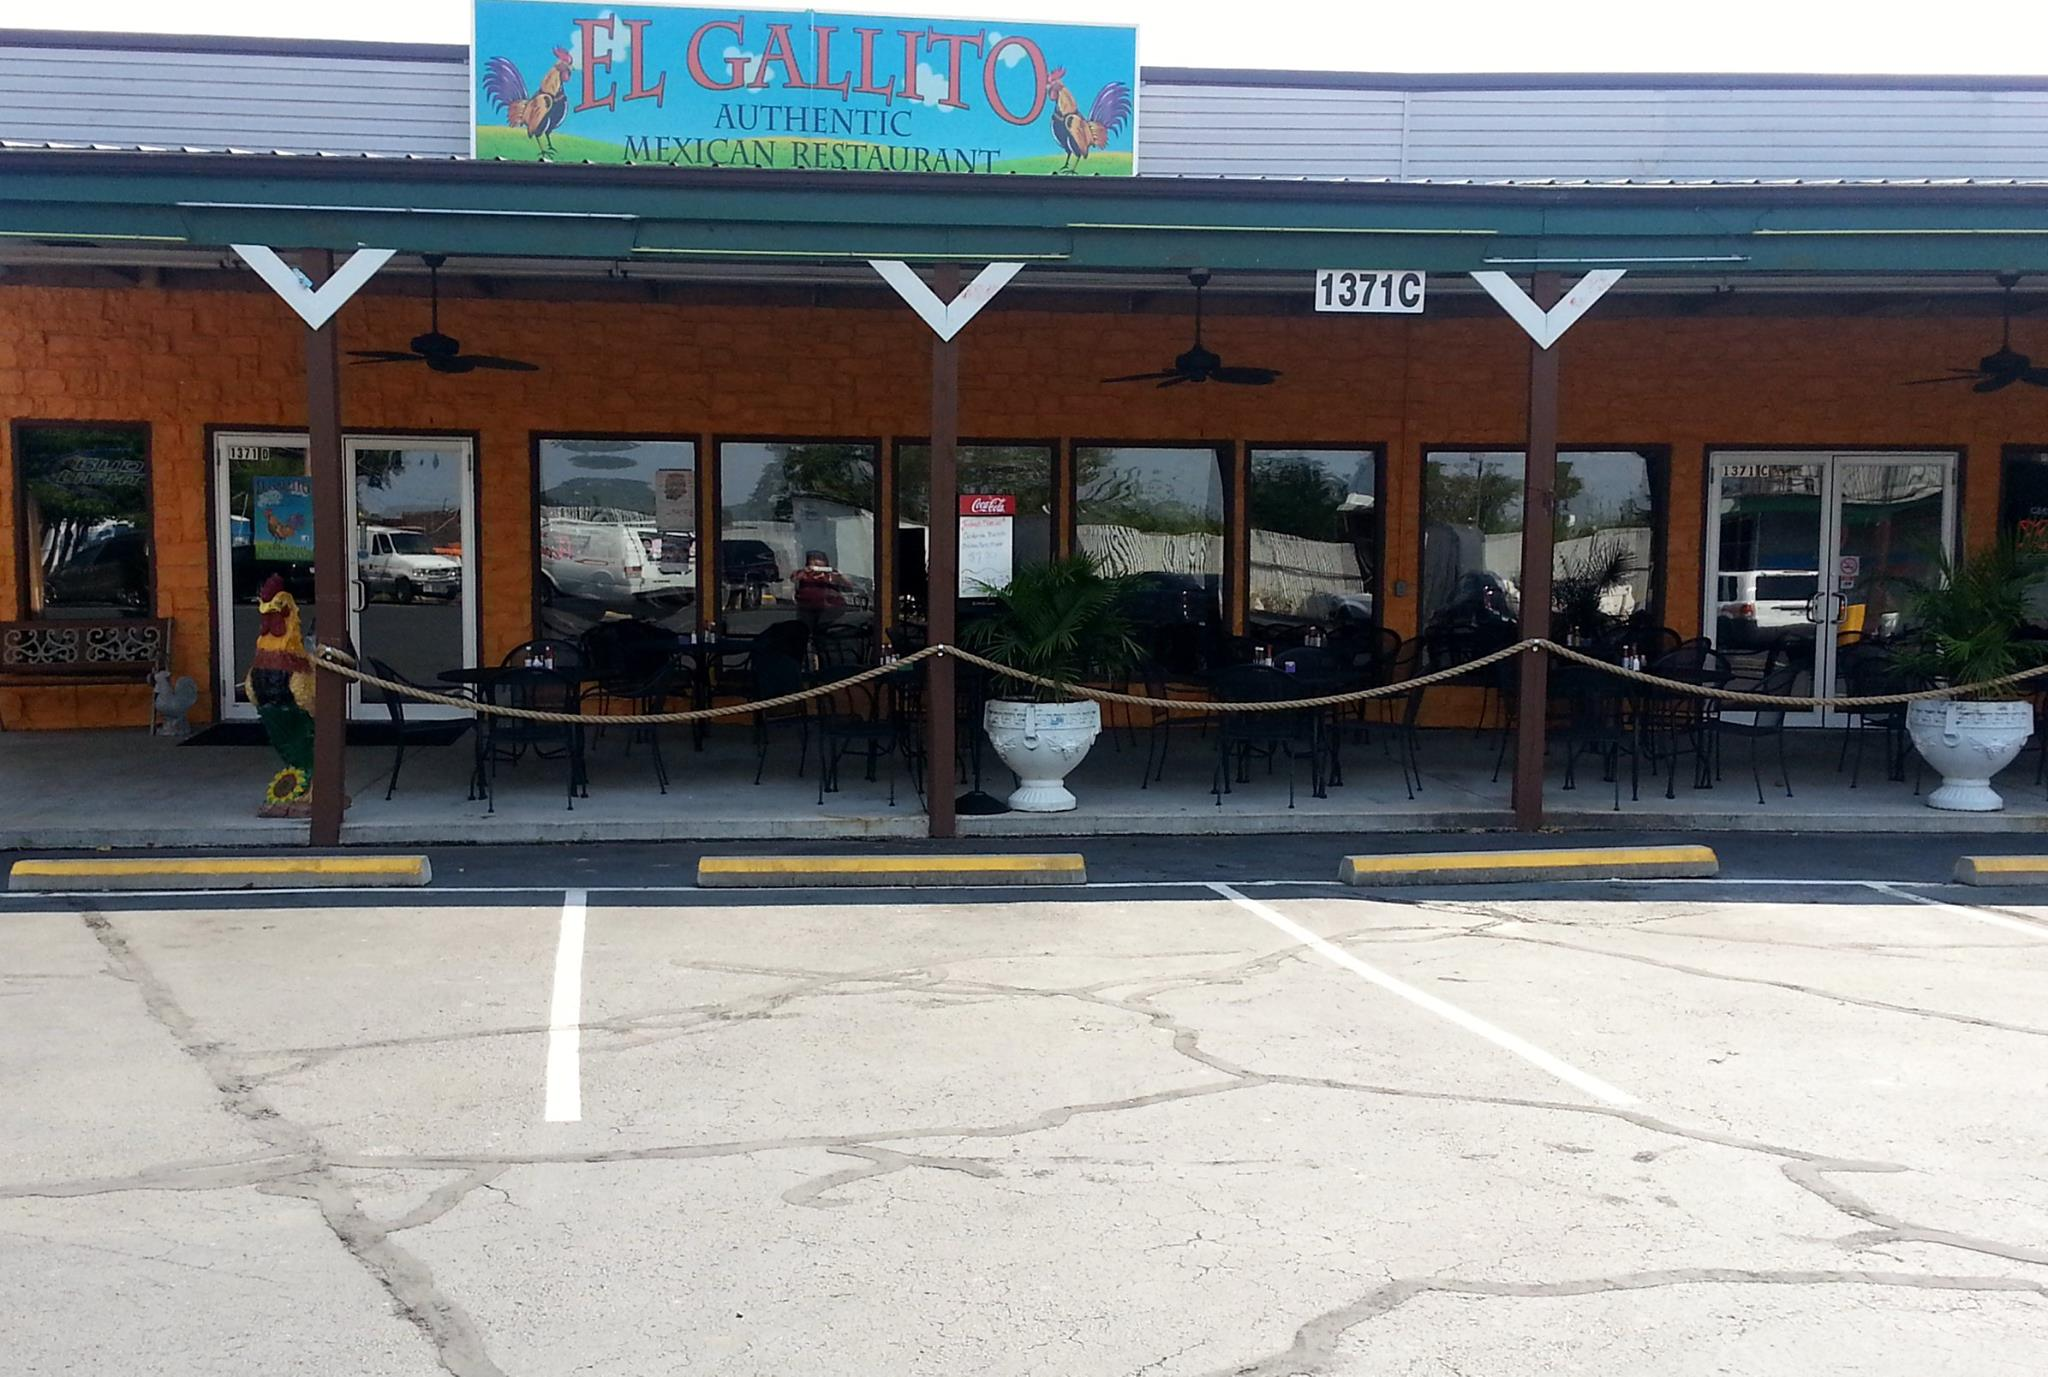 El Gallito Authentic Mexican Restaurant, Lake Ozark MO